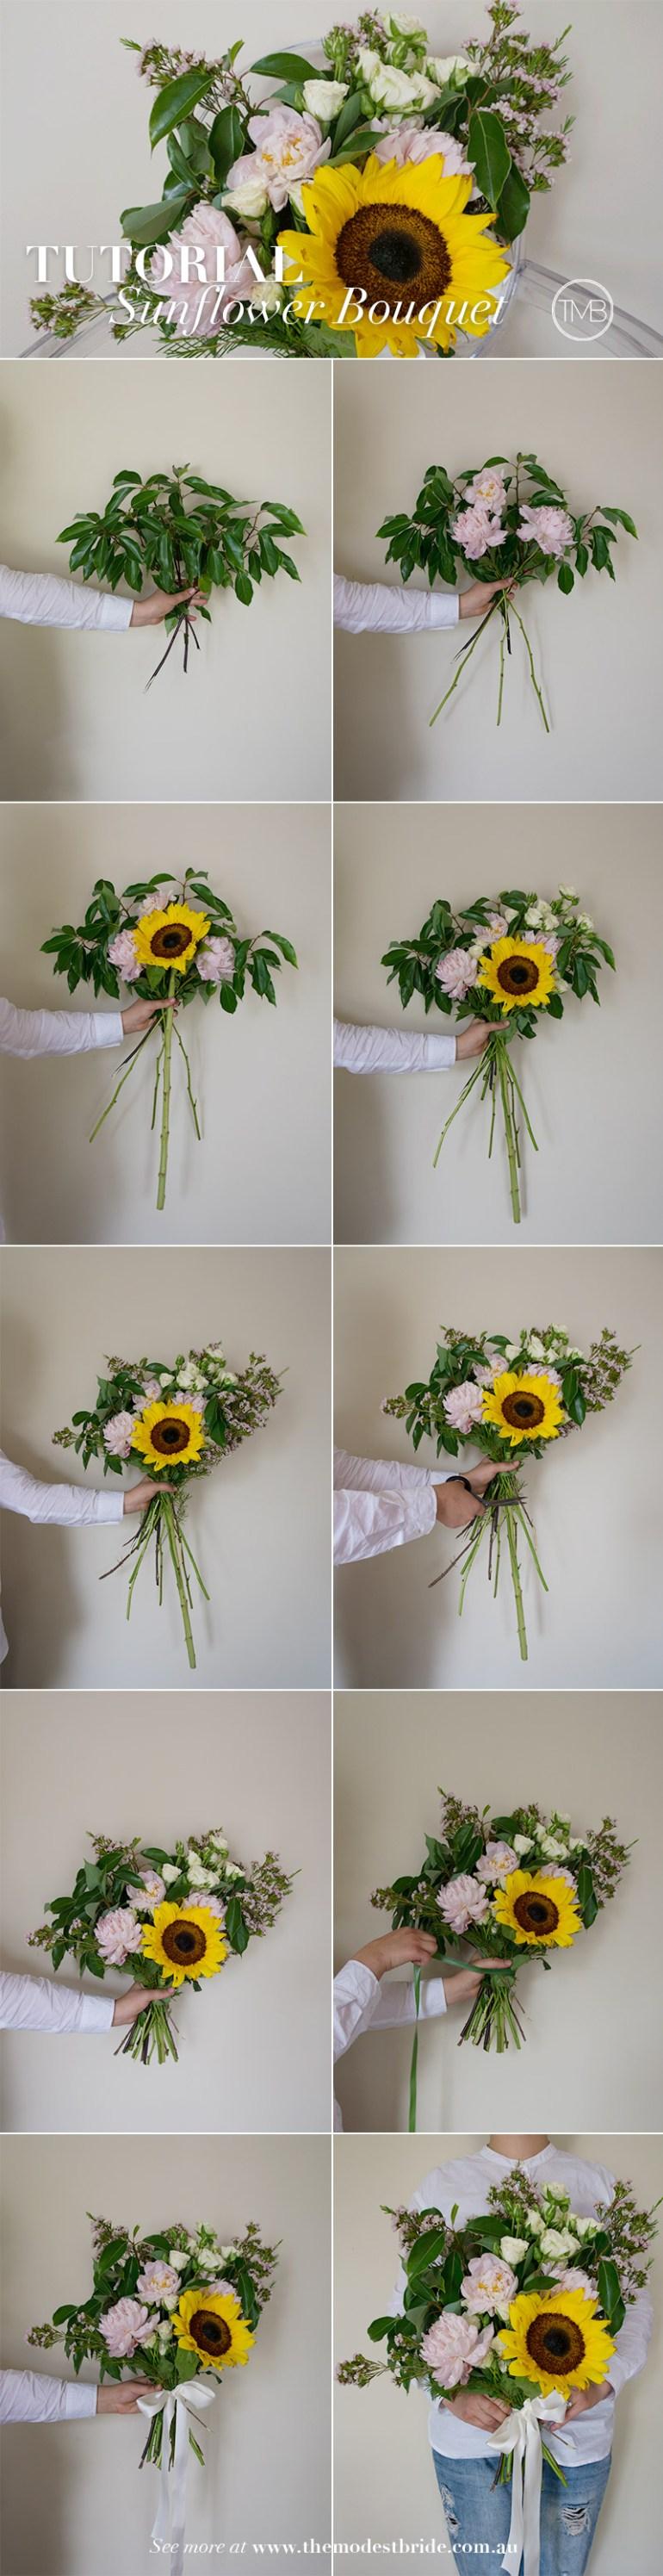 TMB-Sunflower-R2-2